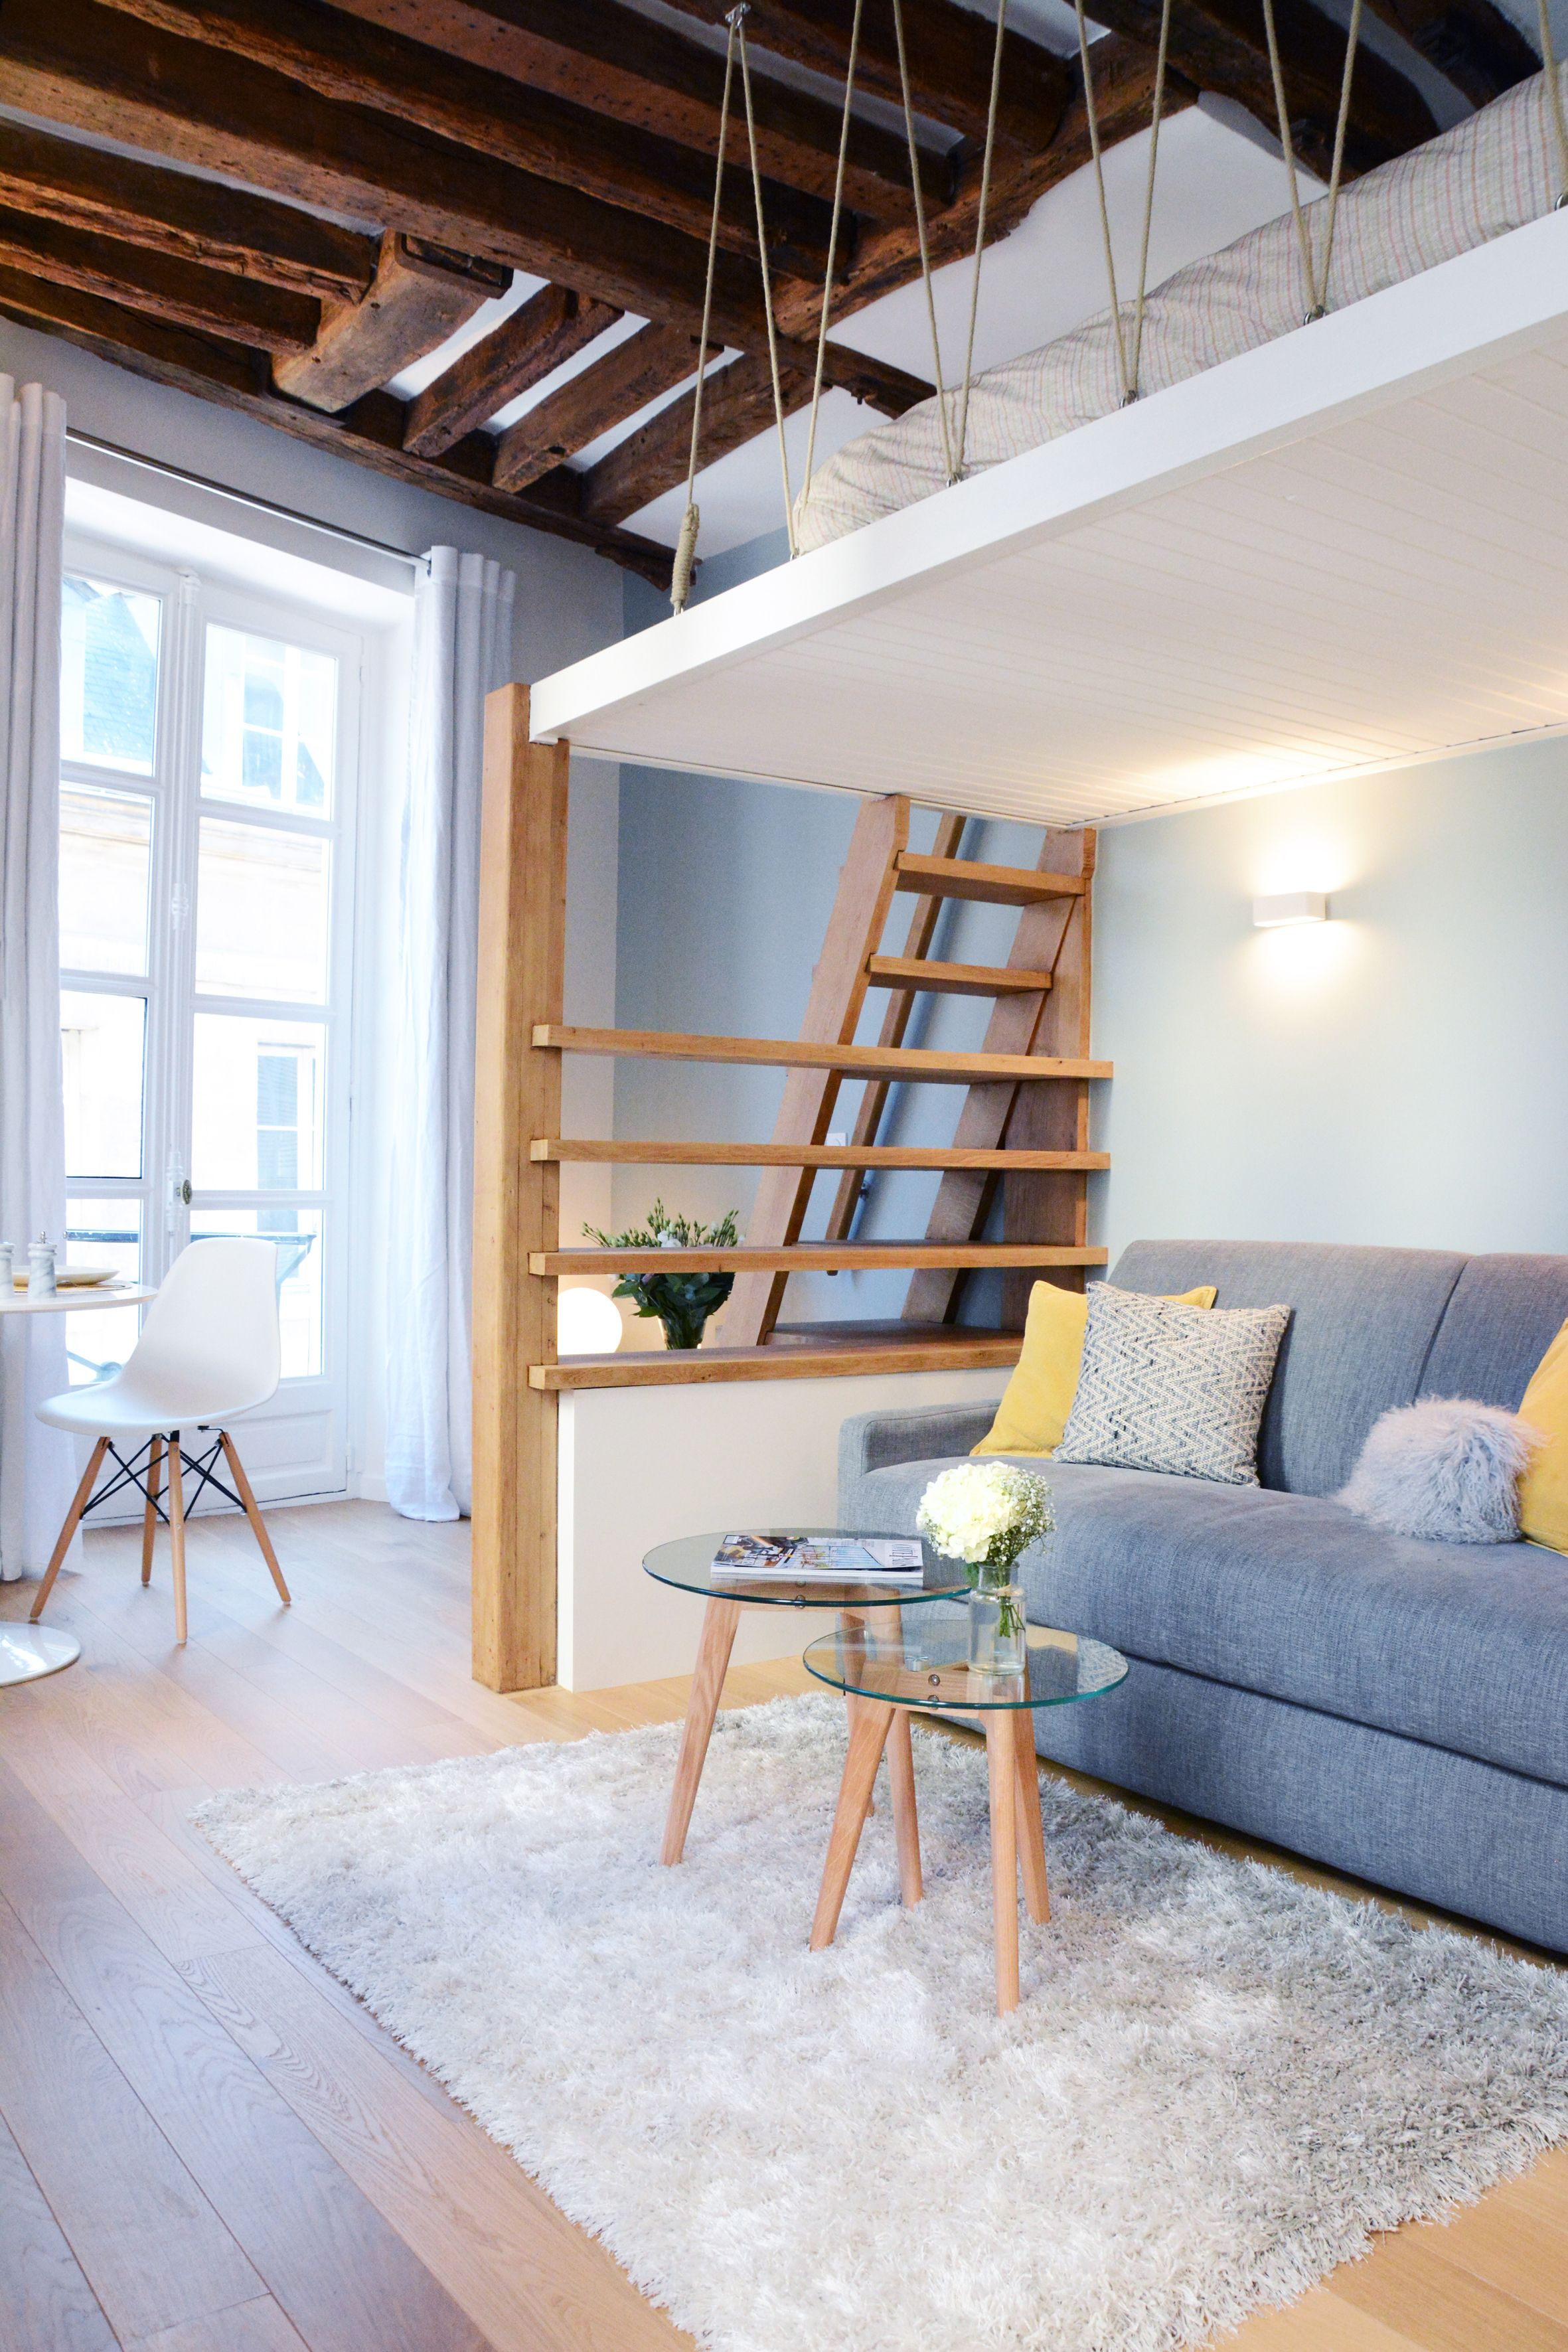 Studio Parisien Avec Mezzanine Petit Appartement Amenagement Petit Appartement Amenagement Studio